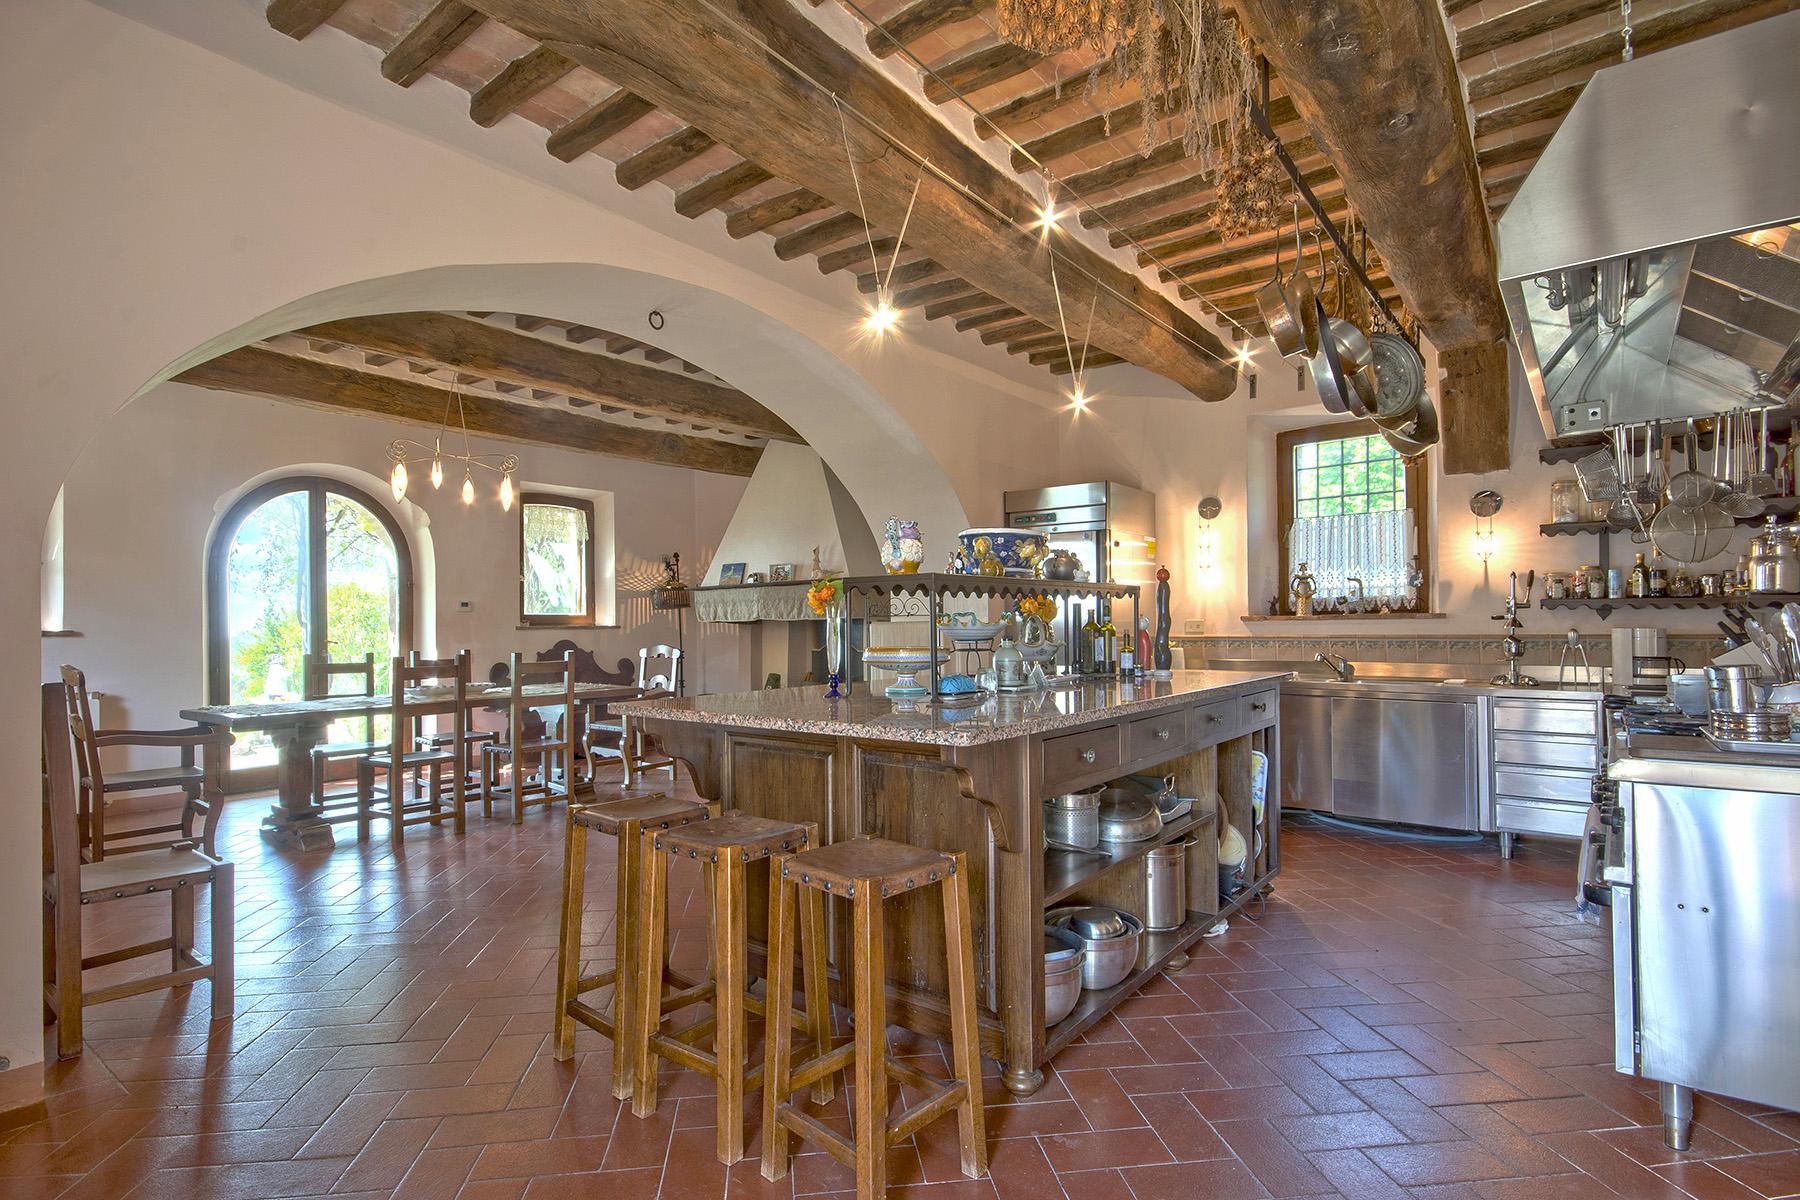 Casa indipendente in Vendita a Pienza: 5 locali, 400 mq - Foto 11